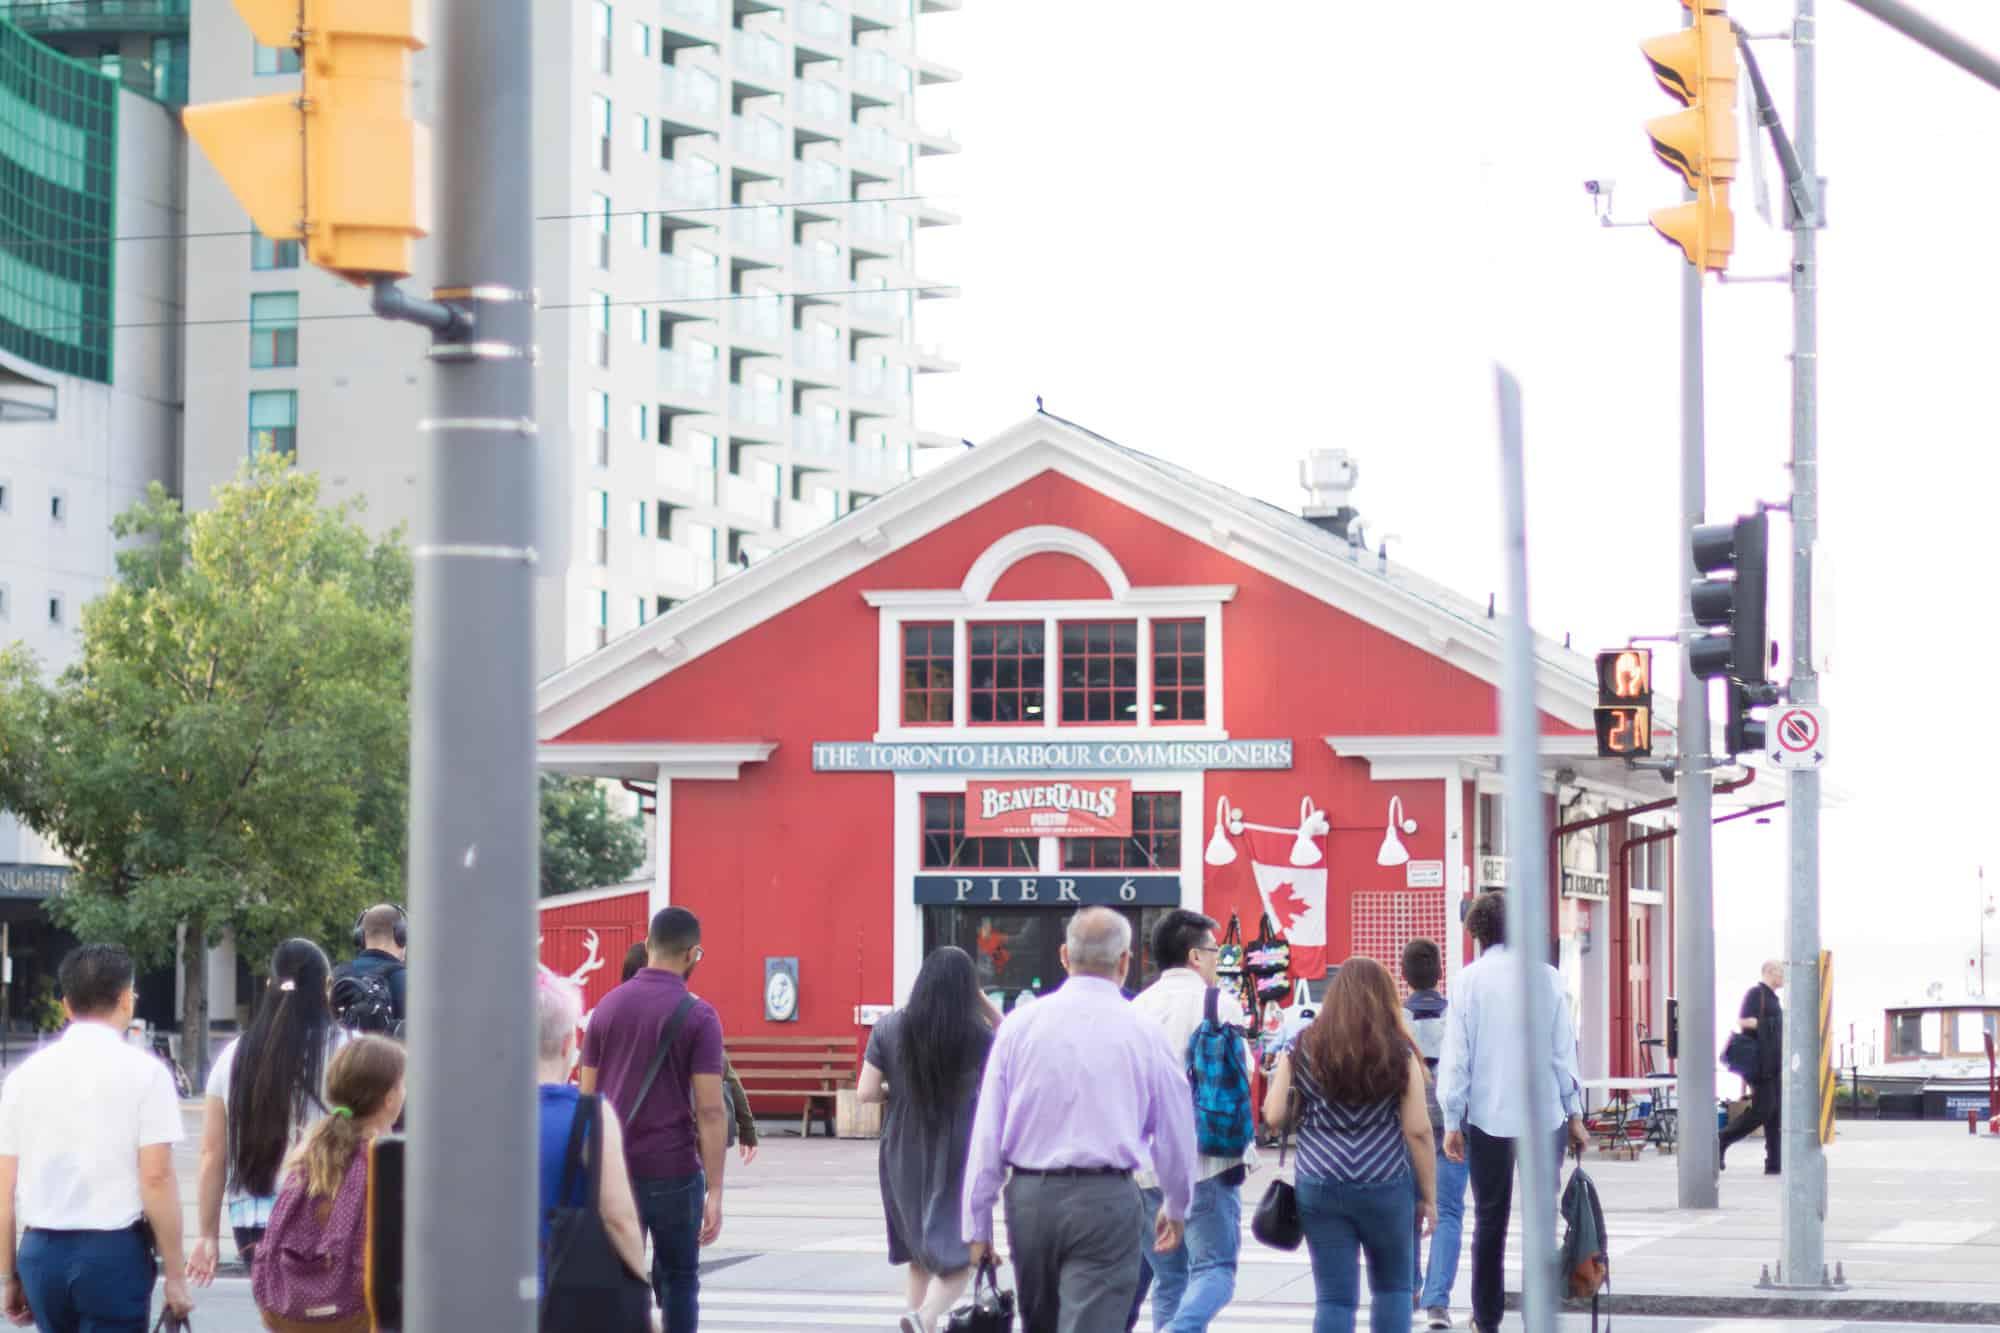 BeaverTails Harbourfront, Toronto